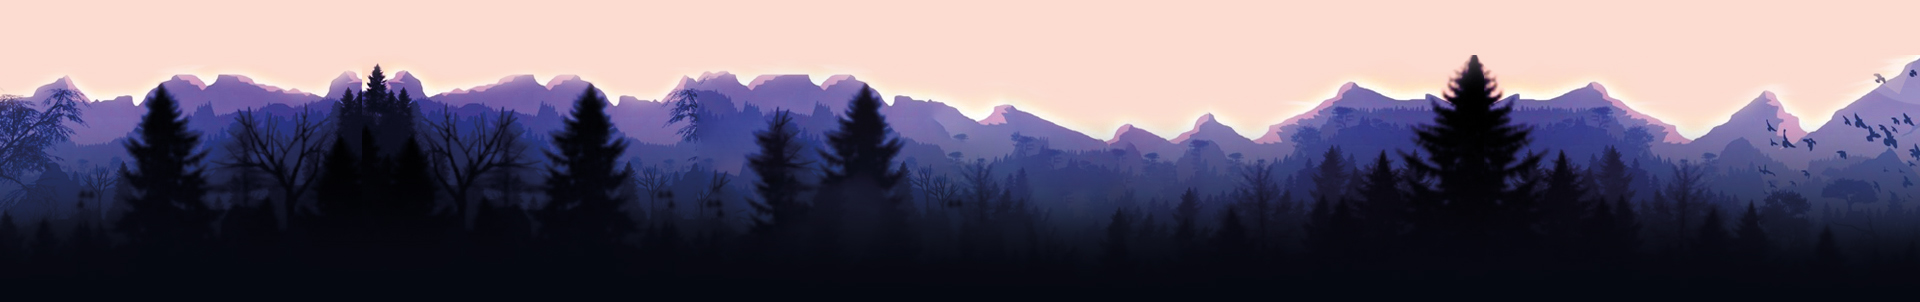 mountains-divider